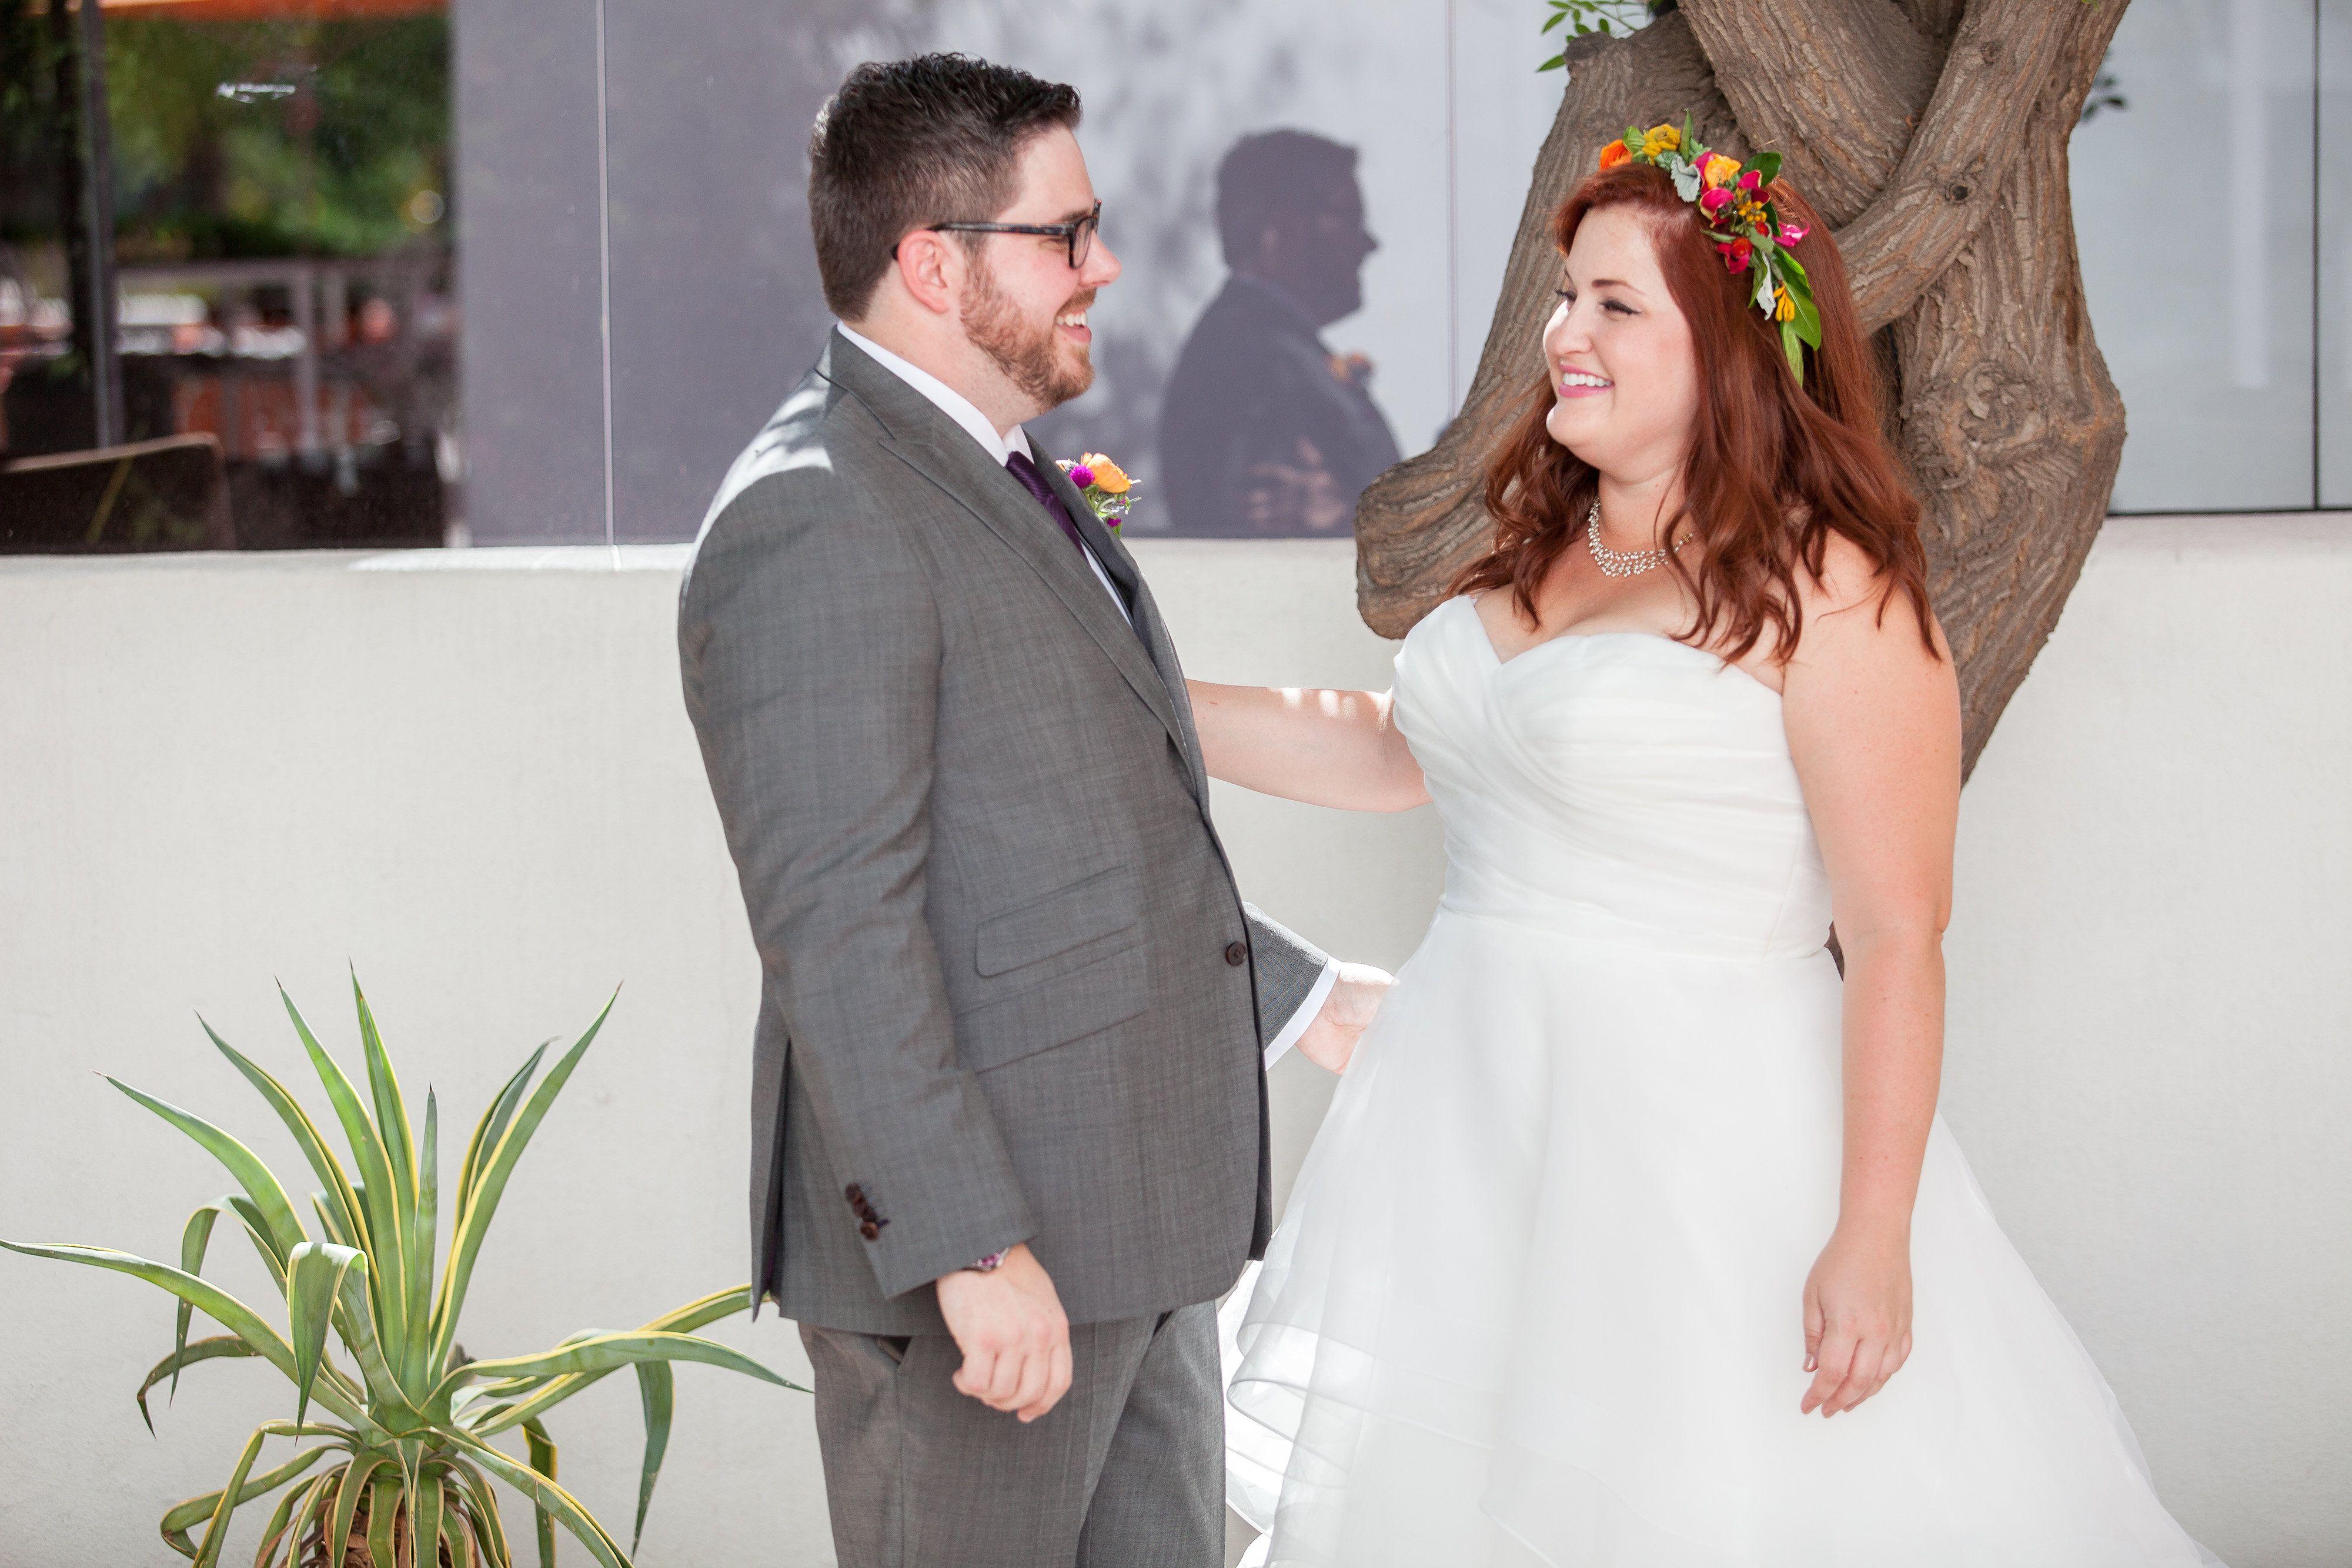 Cool Gray Custom Suit | Groomsmen outfits, Wedding and Wedding